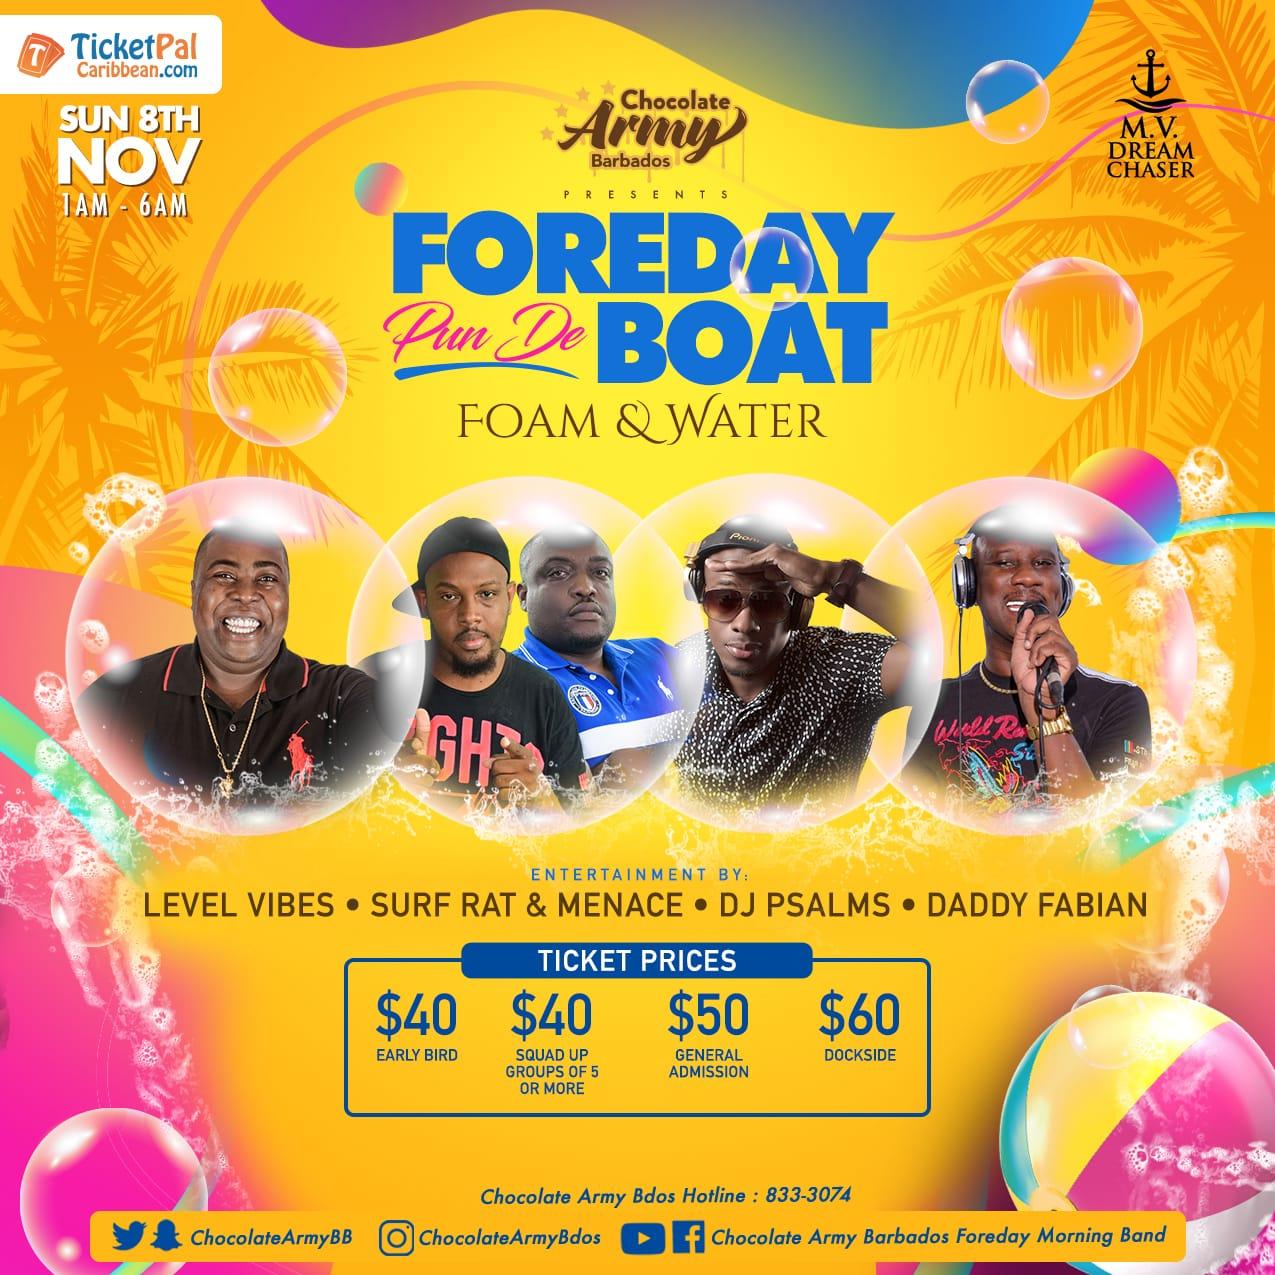 Foreday Pun De Boat